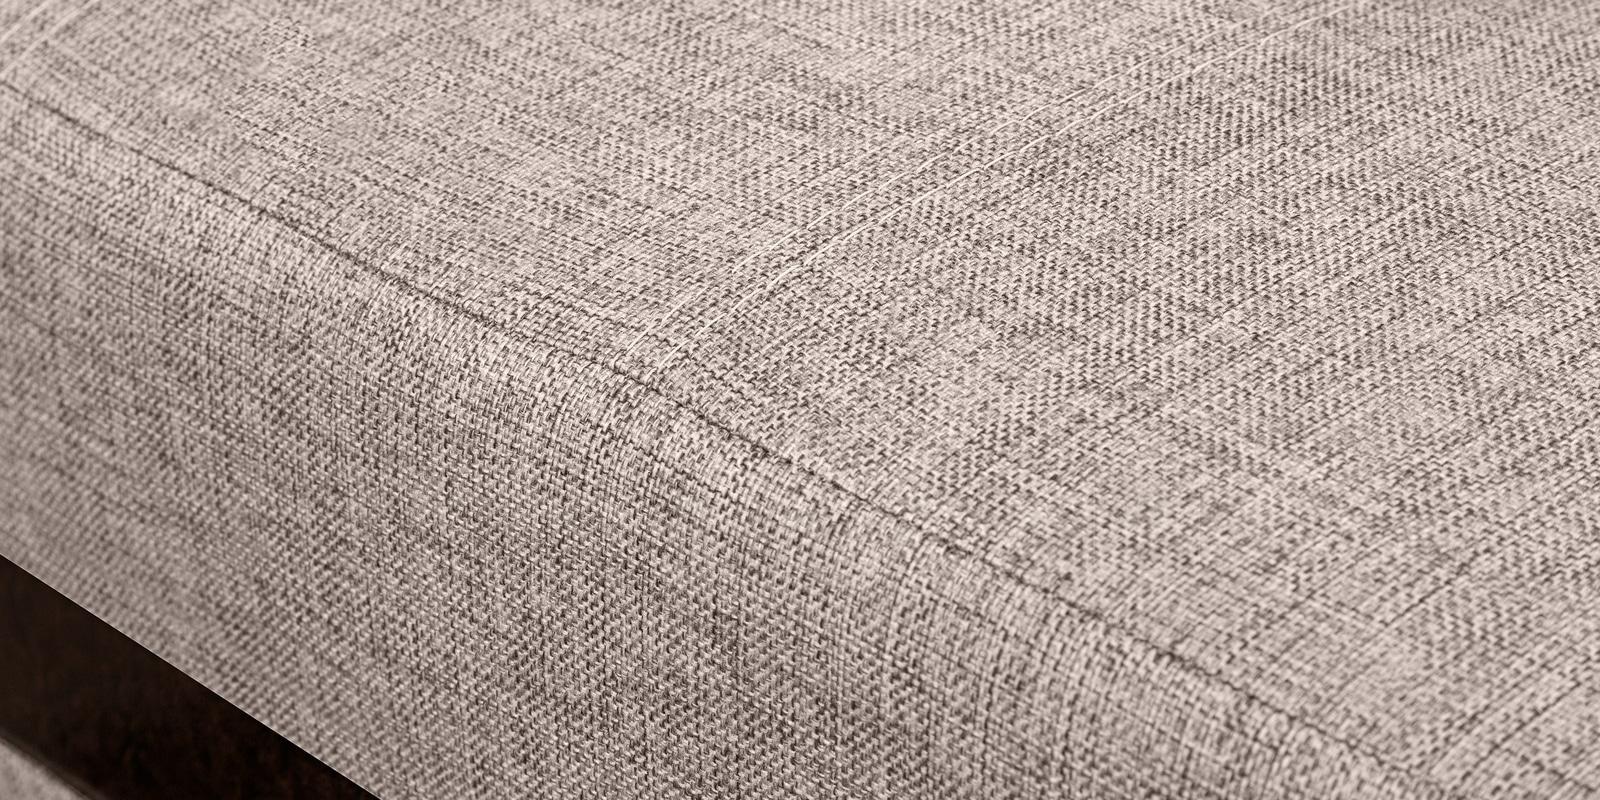 Угловой диван Атланта рогожка темно-бежевого цвета фото 7 | интернет-магазин Складно